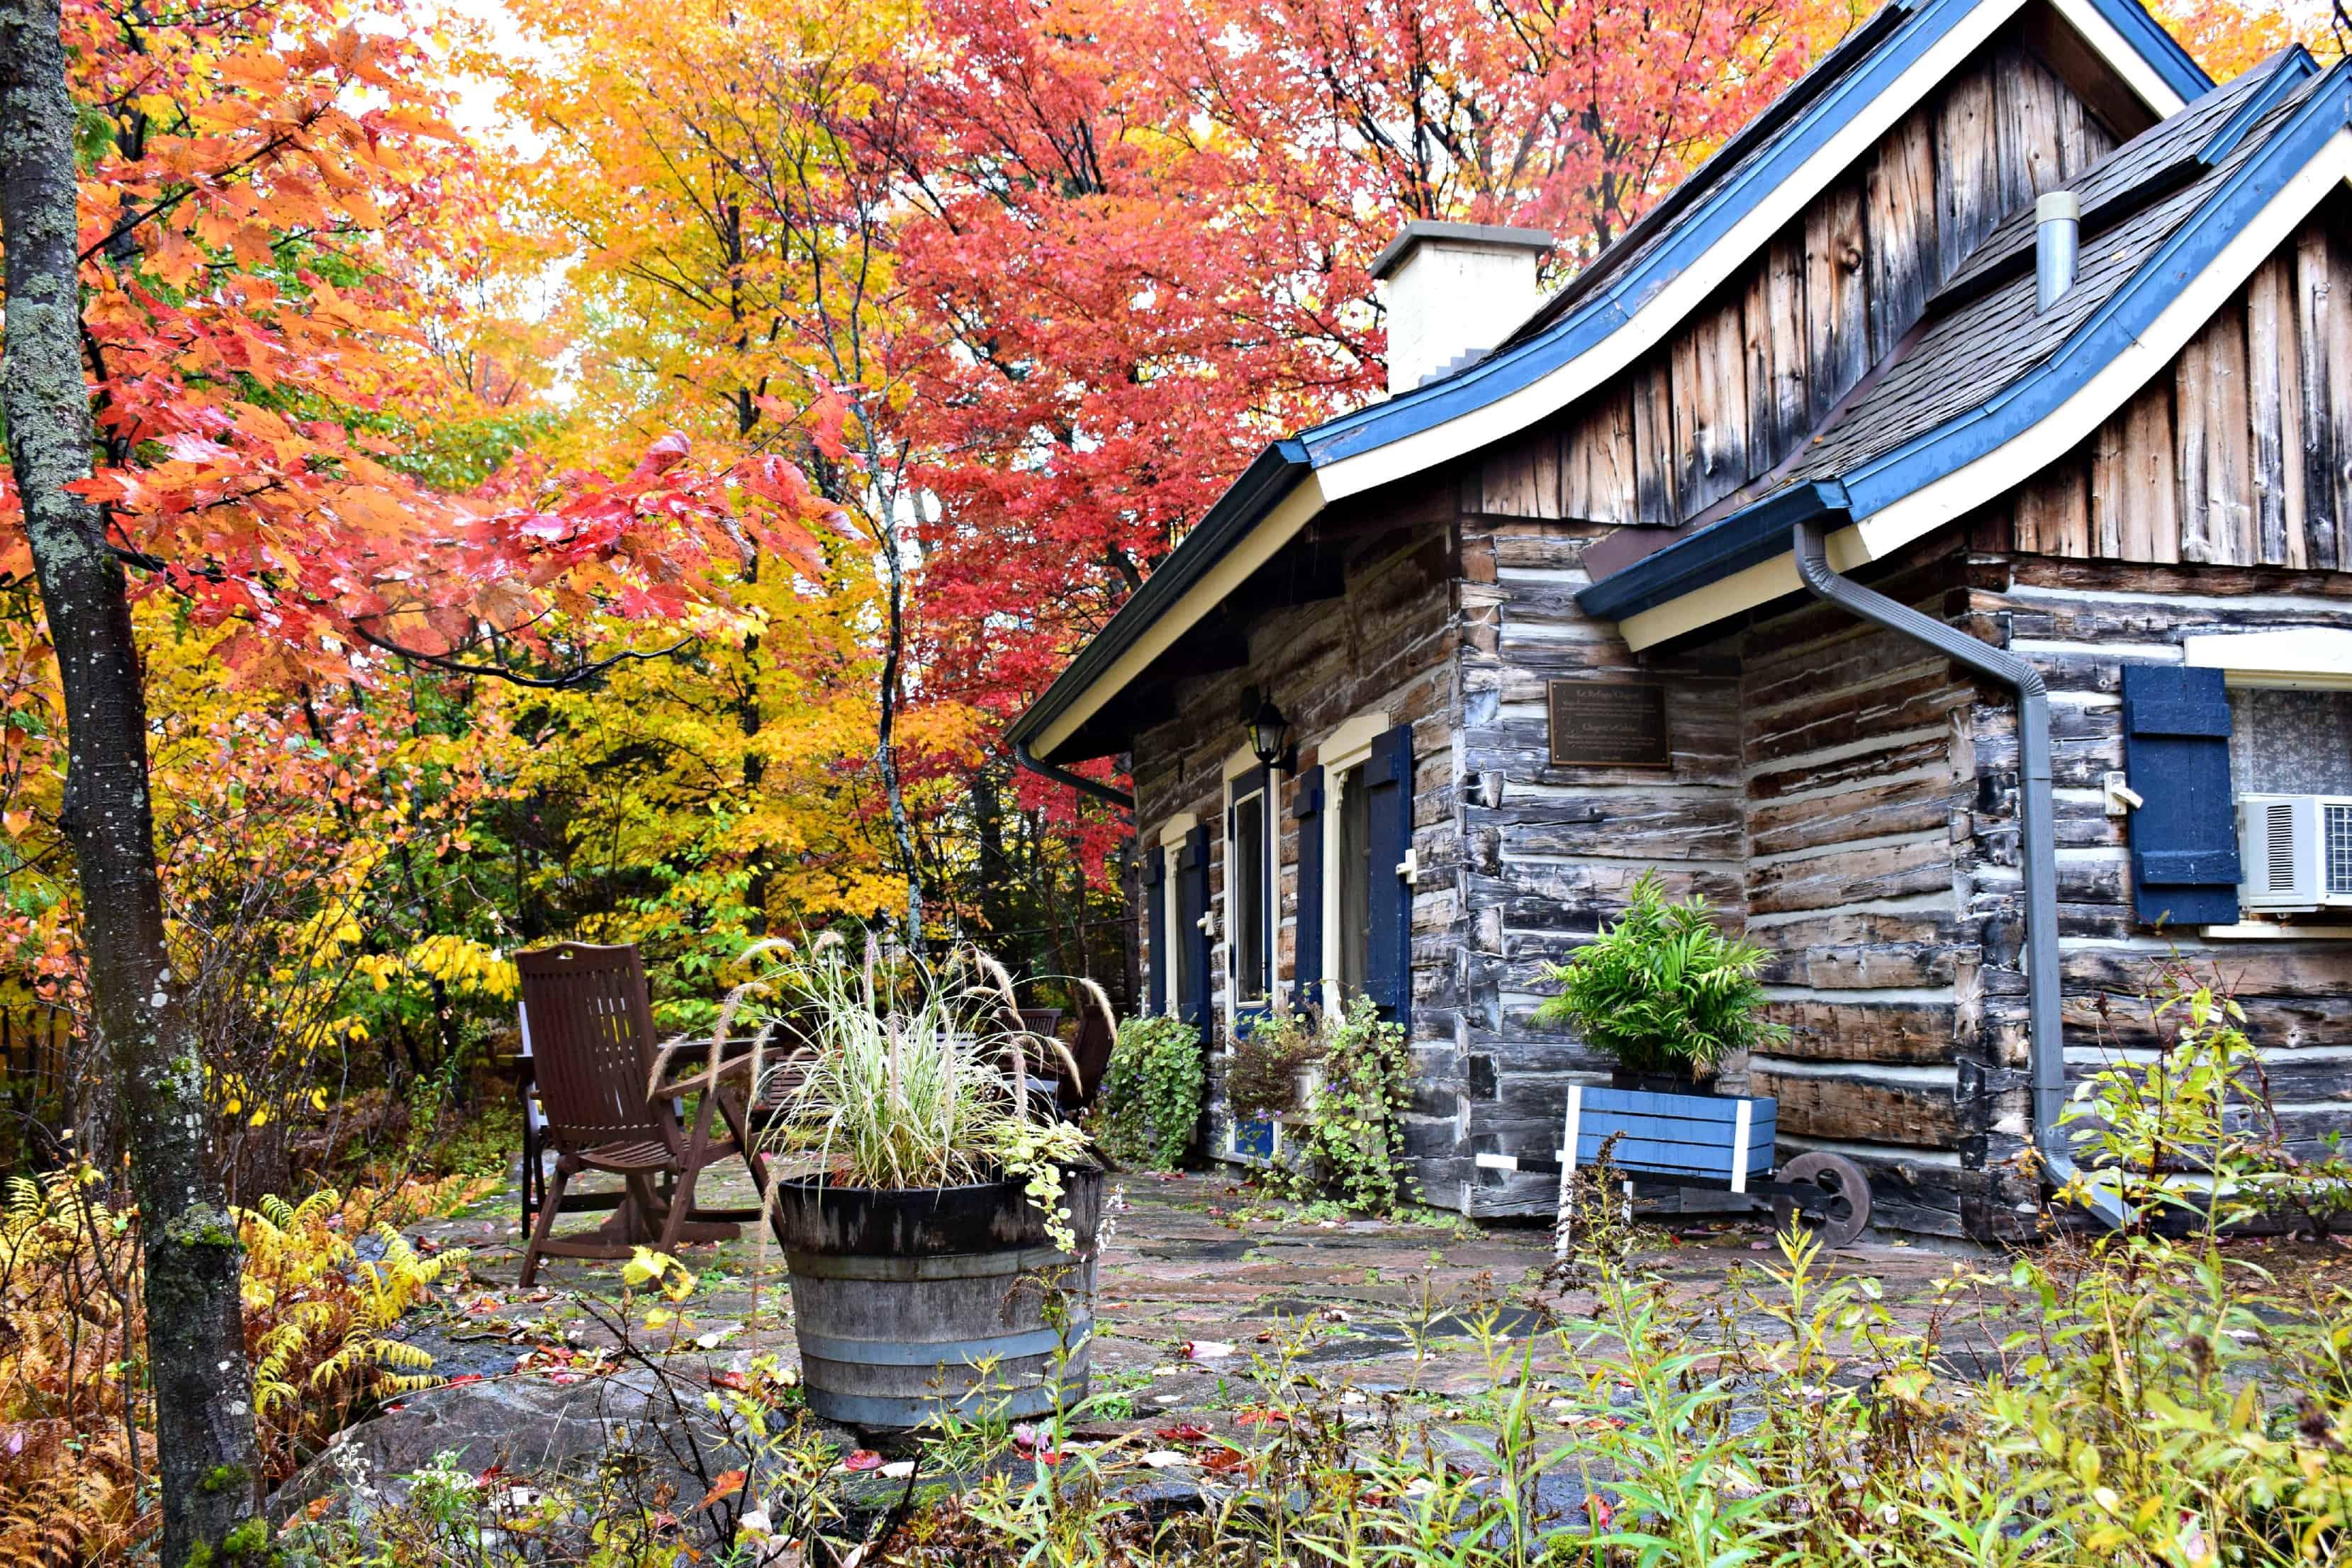 Clagett's Cabin, Hotel Quintessence